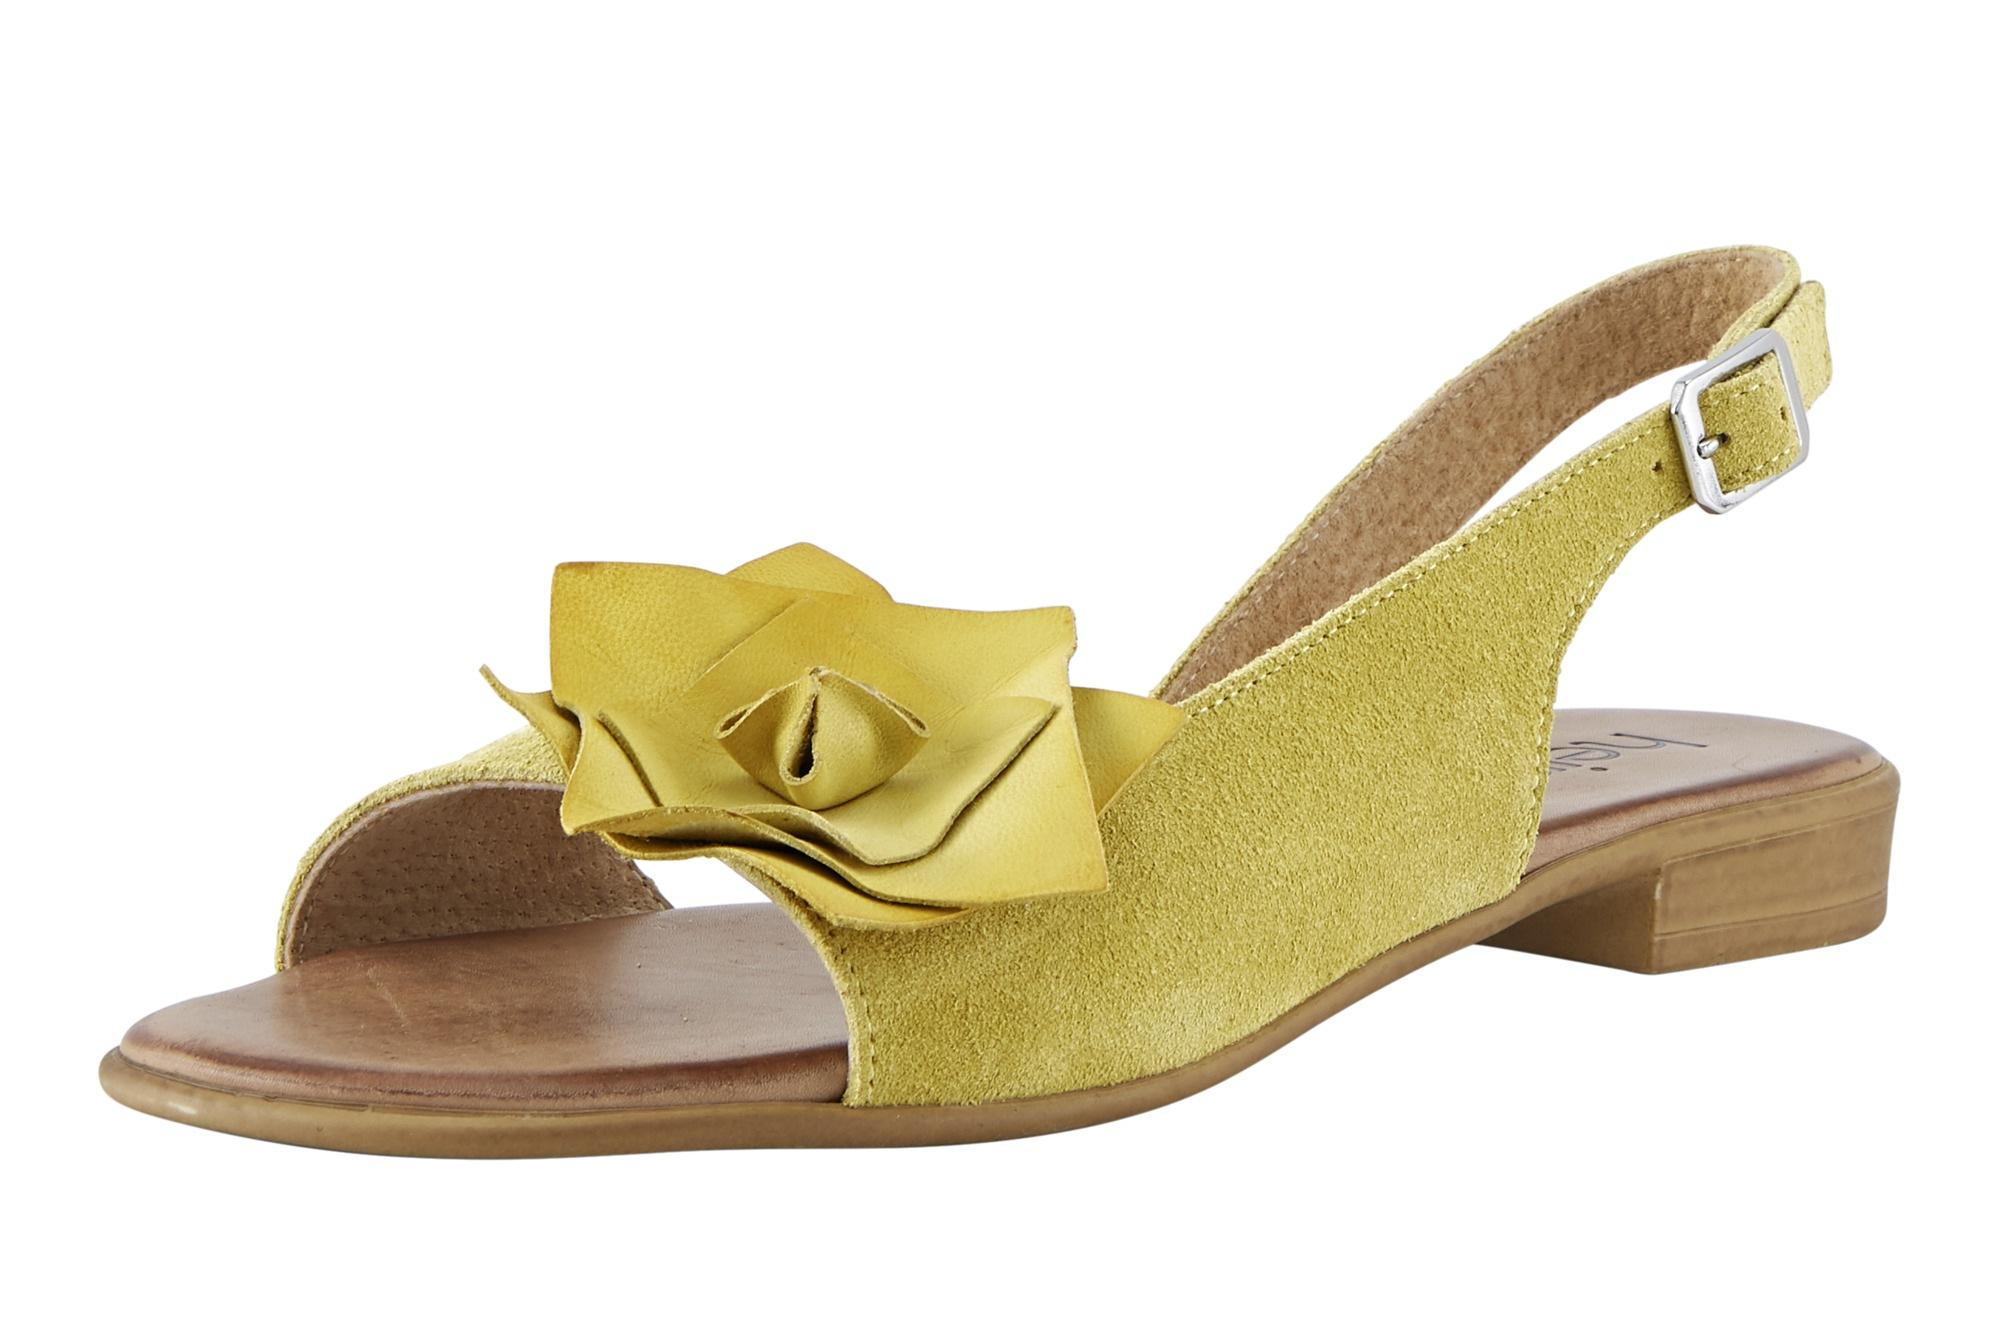 heine -  Sandalette mit großer Bllütenapplikation